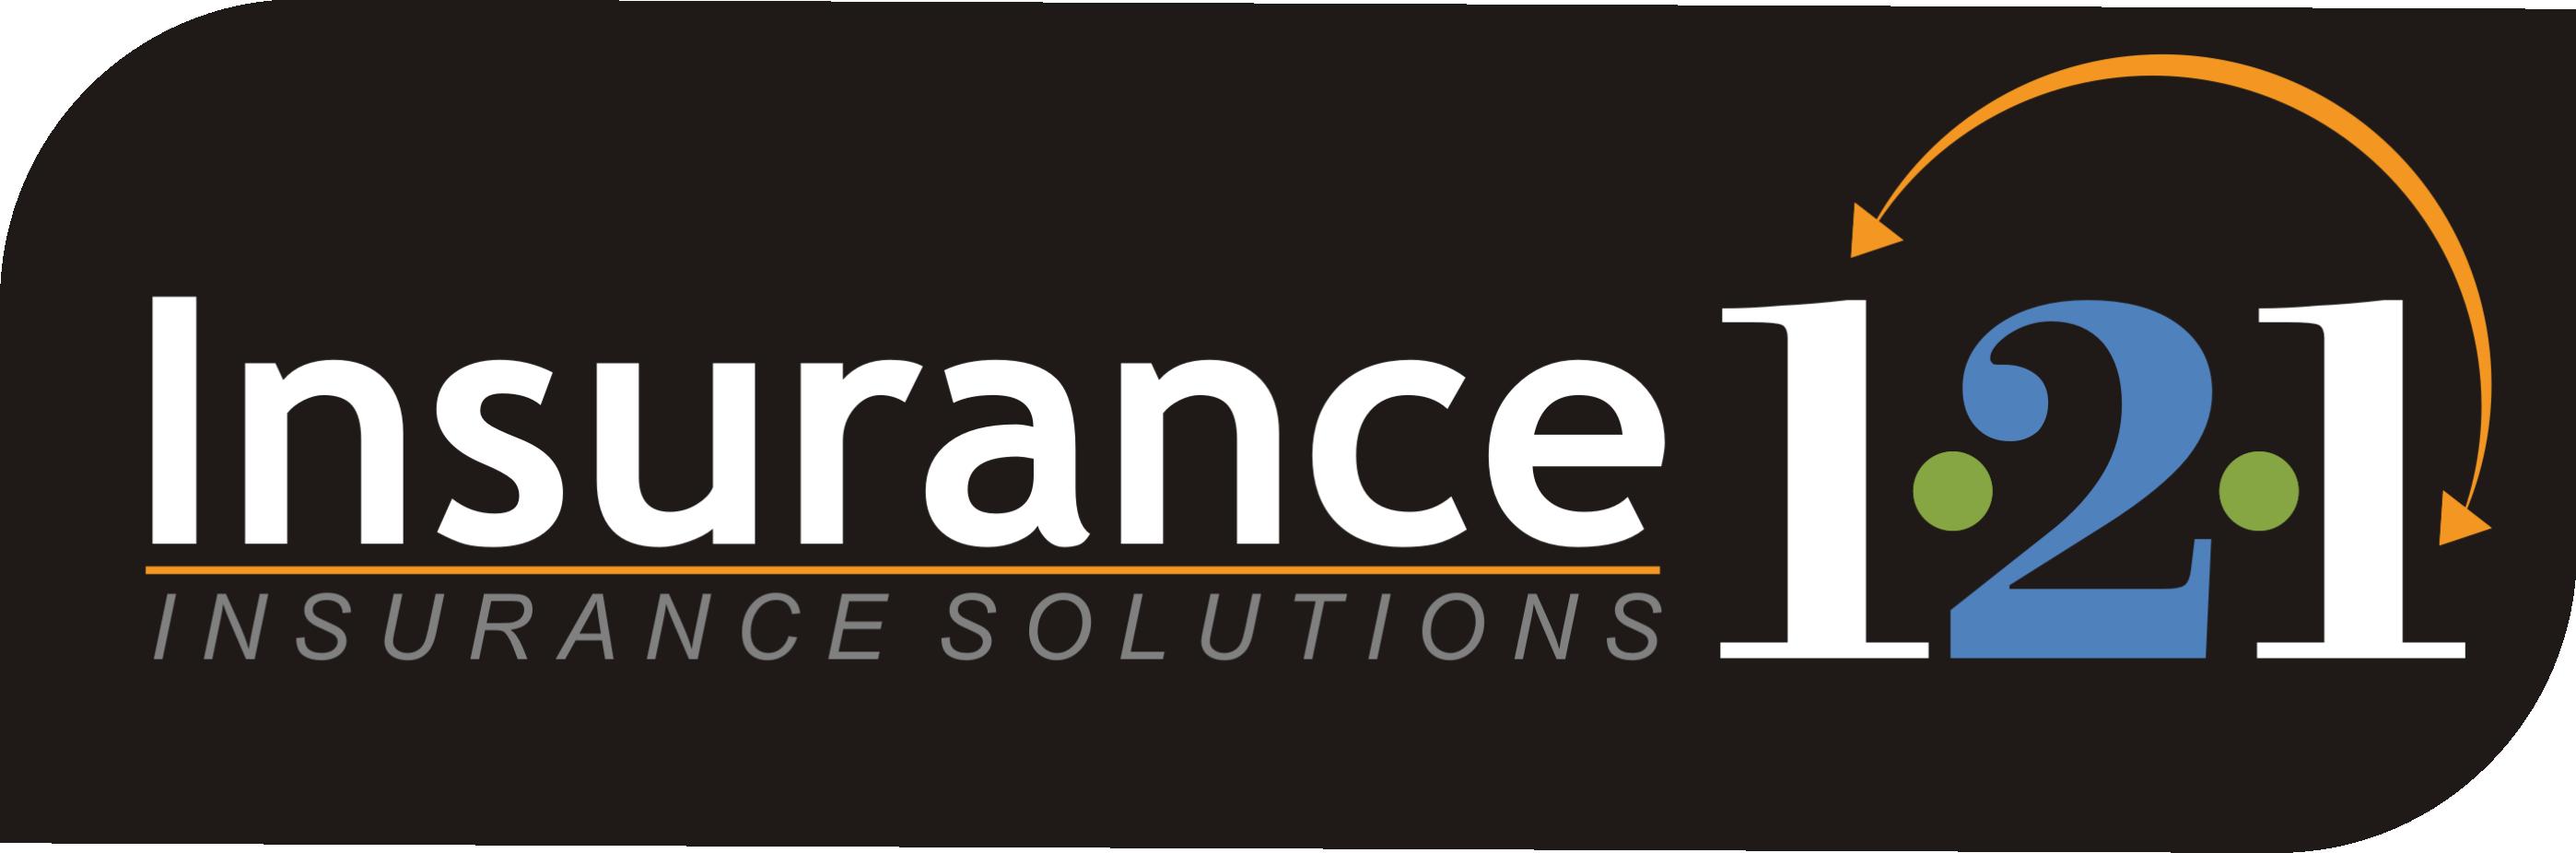 Insurance121 Insurance Solutions